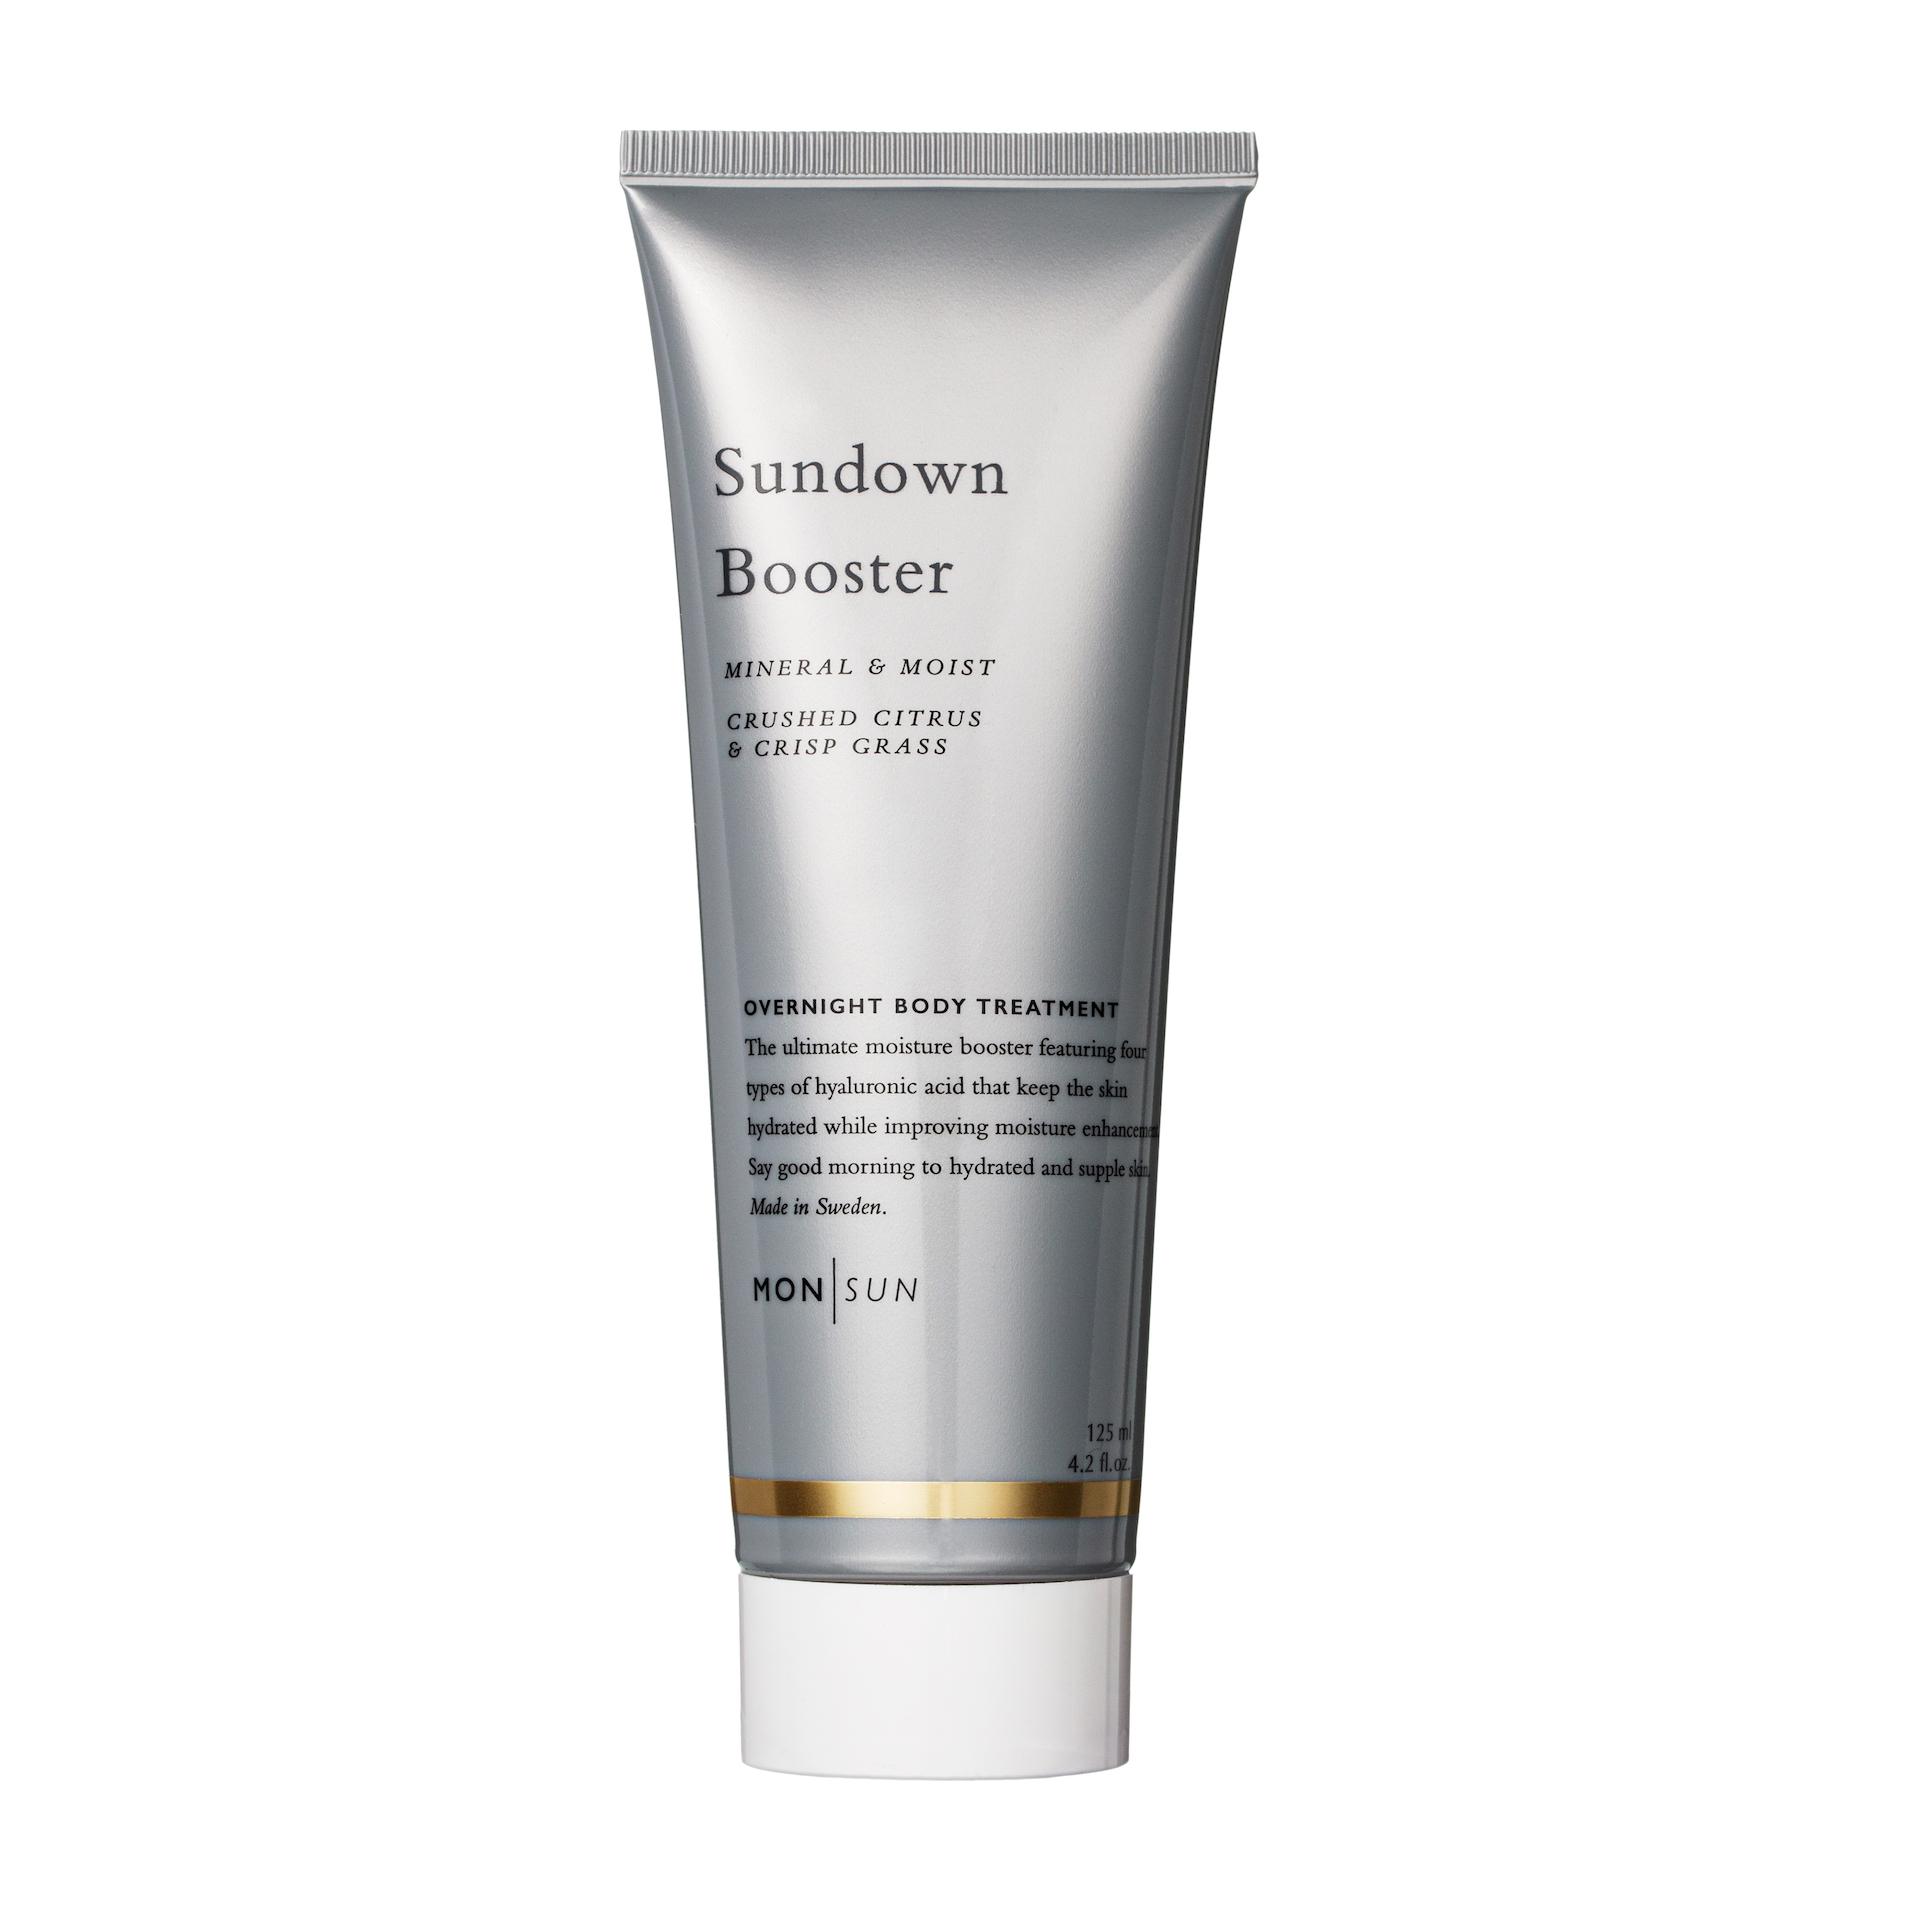 Sundown Booster Mineral & Moist Overnight Body Treatment